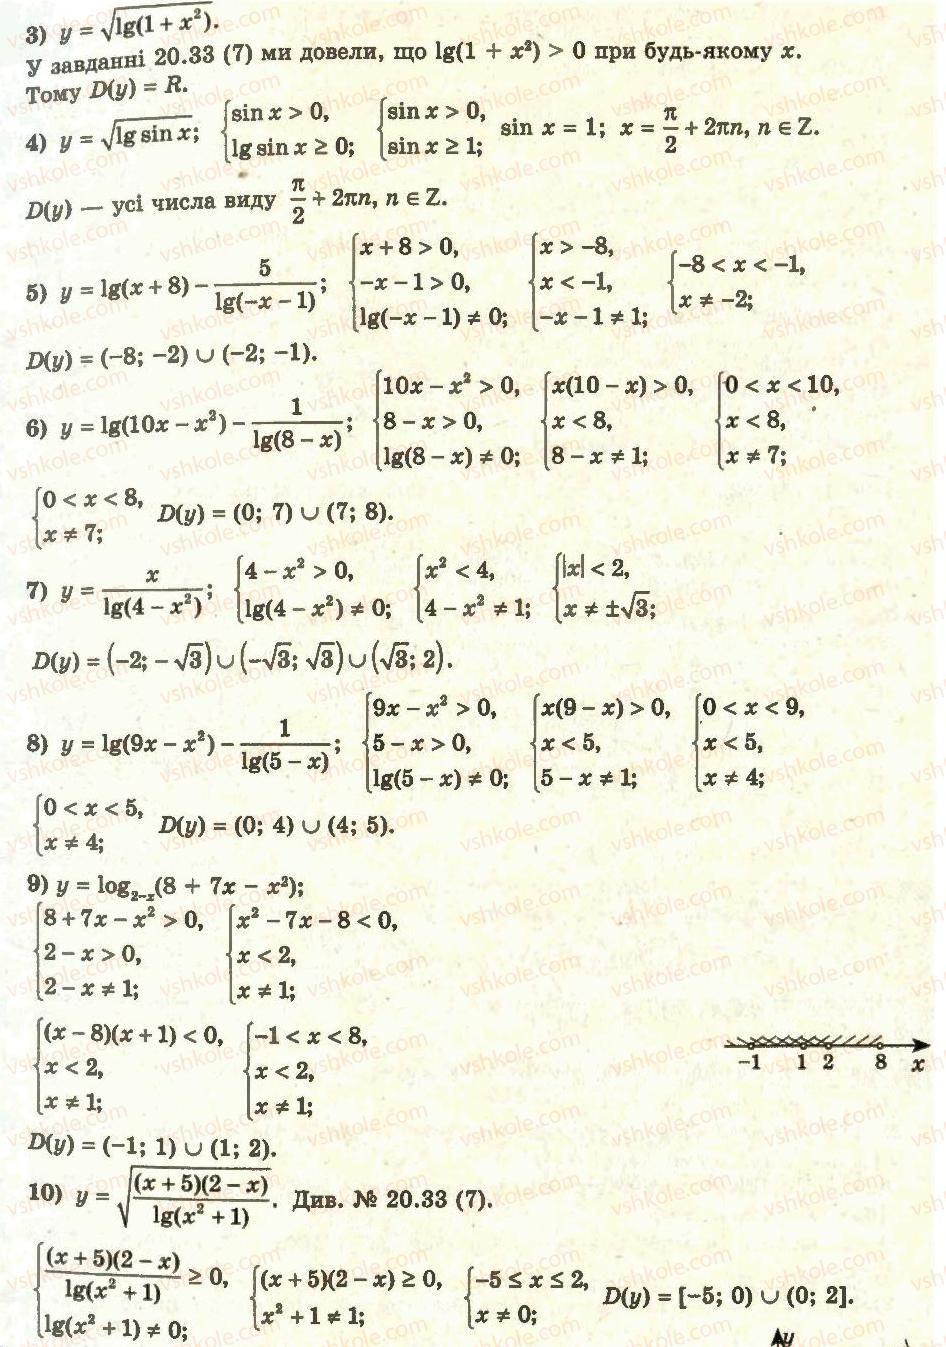 11-algebra-ag-merzlyak-da-nomirovskij-vb-polonskij-ms-yakir-2011-akademichnij-profilnij-rivni--2-pokaznikova-i-logarifmichna-funktsiyi-20-logarifmichna-funktsiya-ta-yiyi-vlastivosti-34-rnd4672.jpg